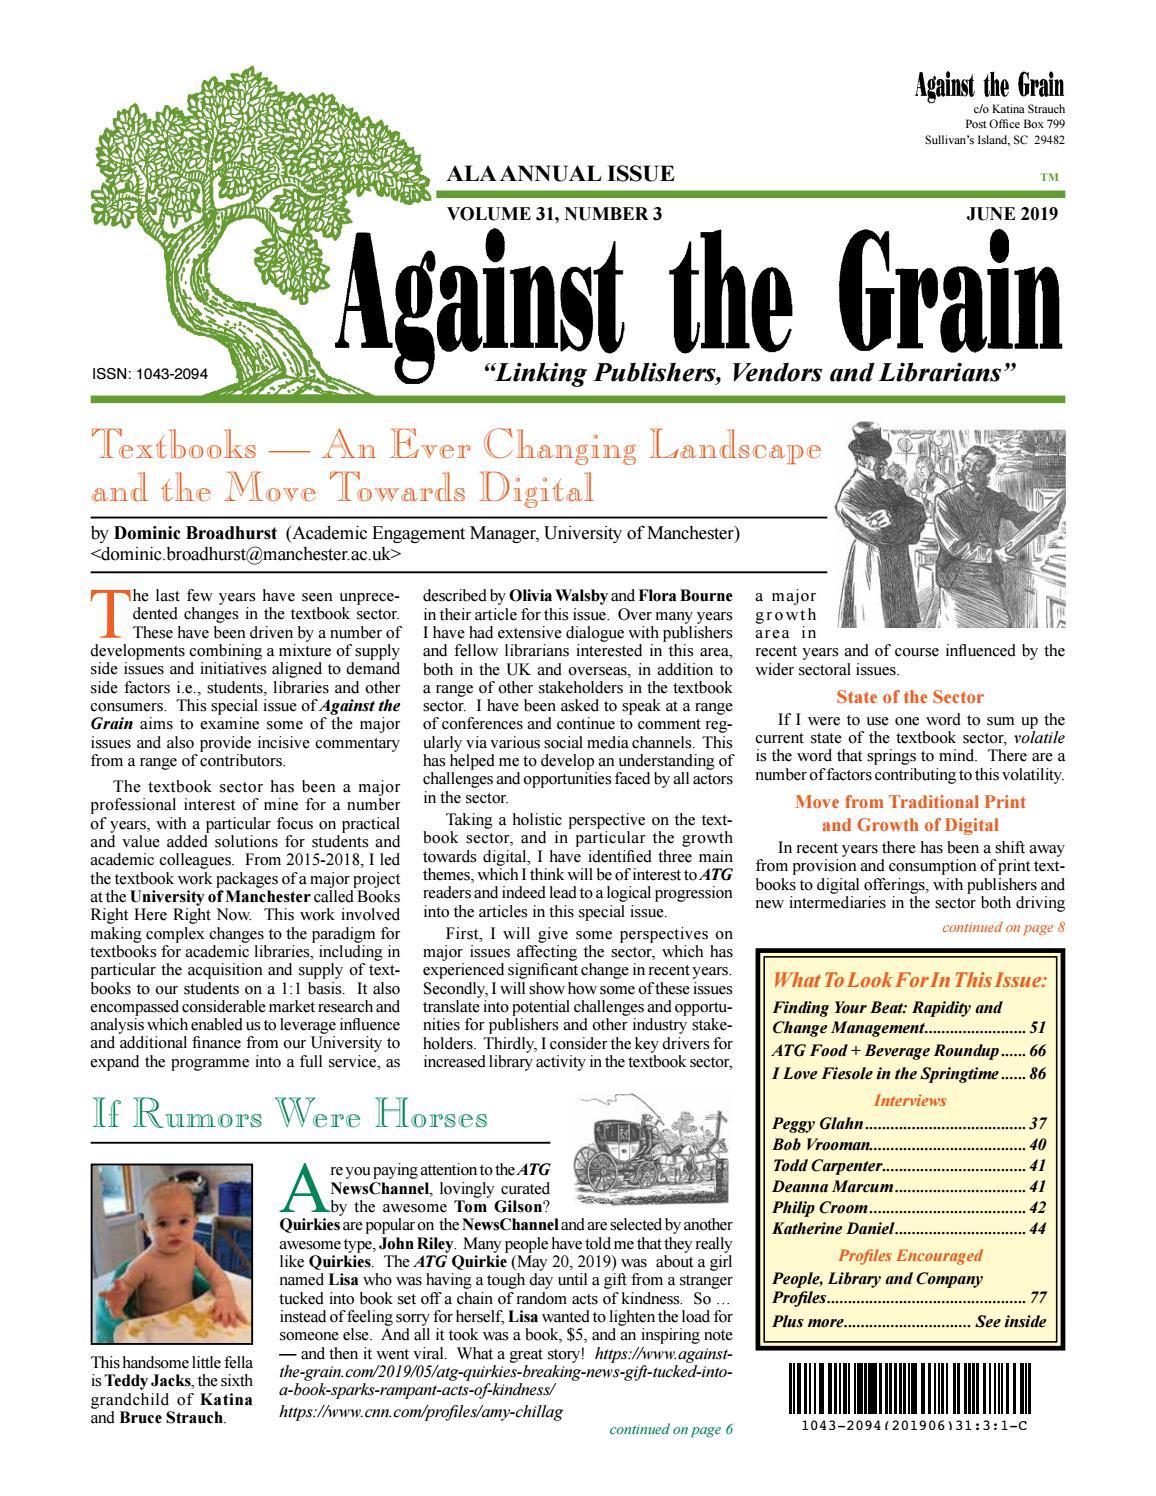 Against the Grain v31 #3 June 2019 by against-the-grain - issuu